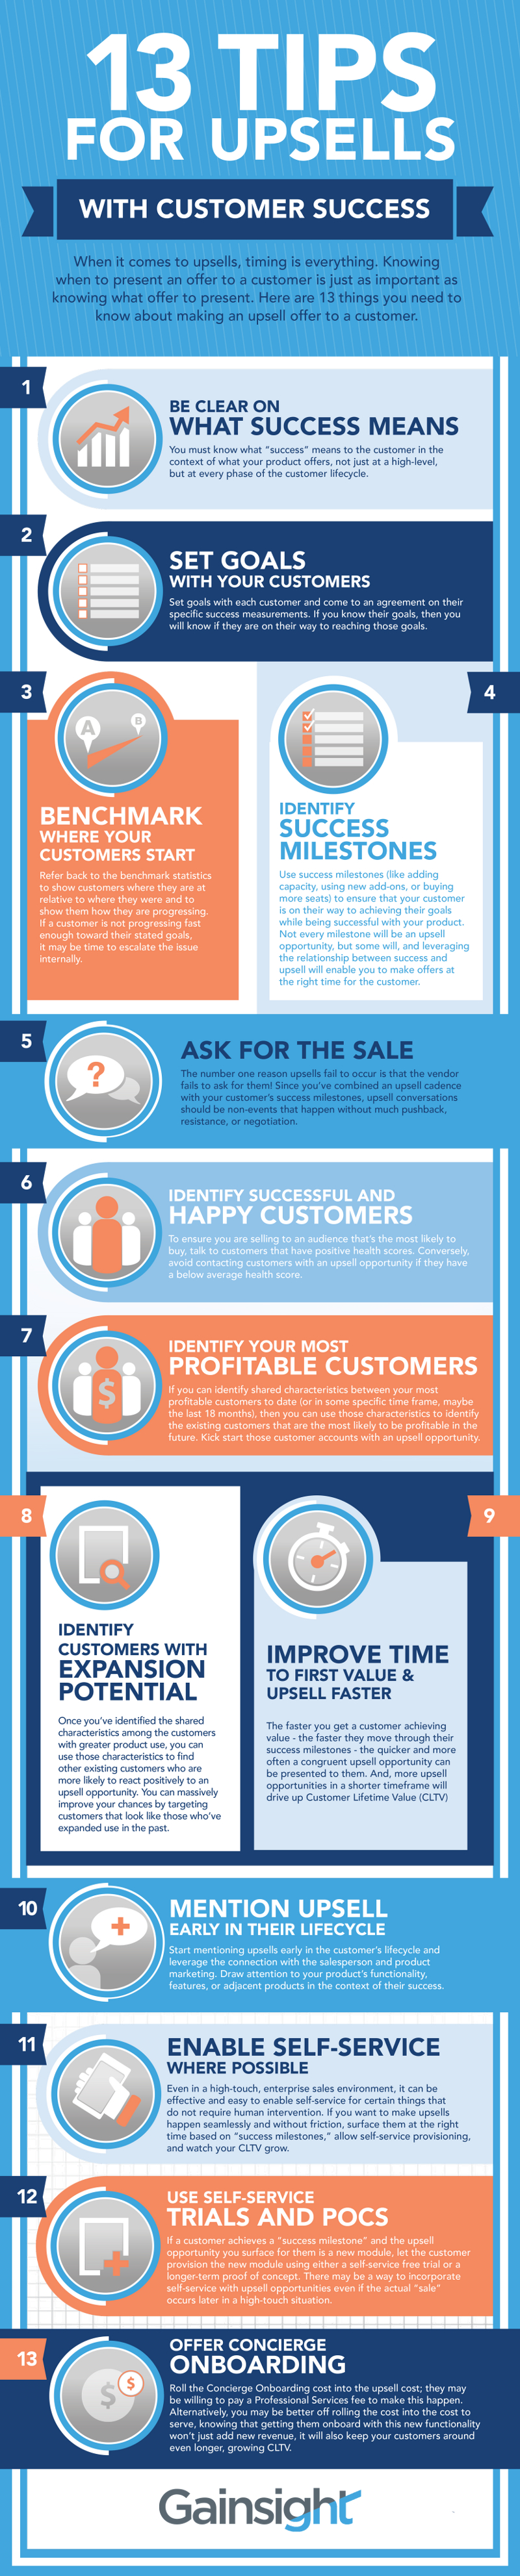 Getting-More-Customer-Upsells